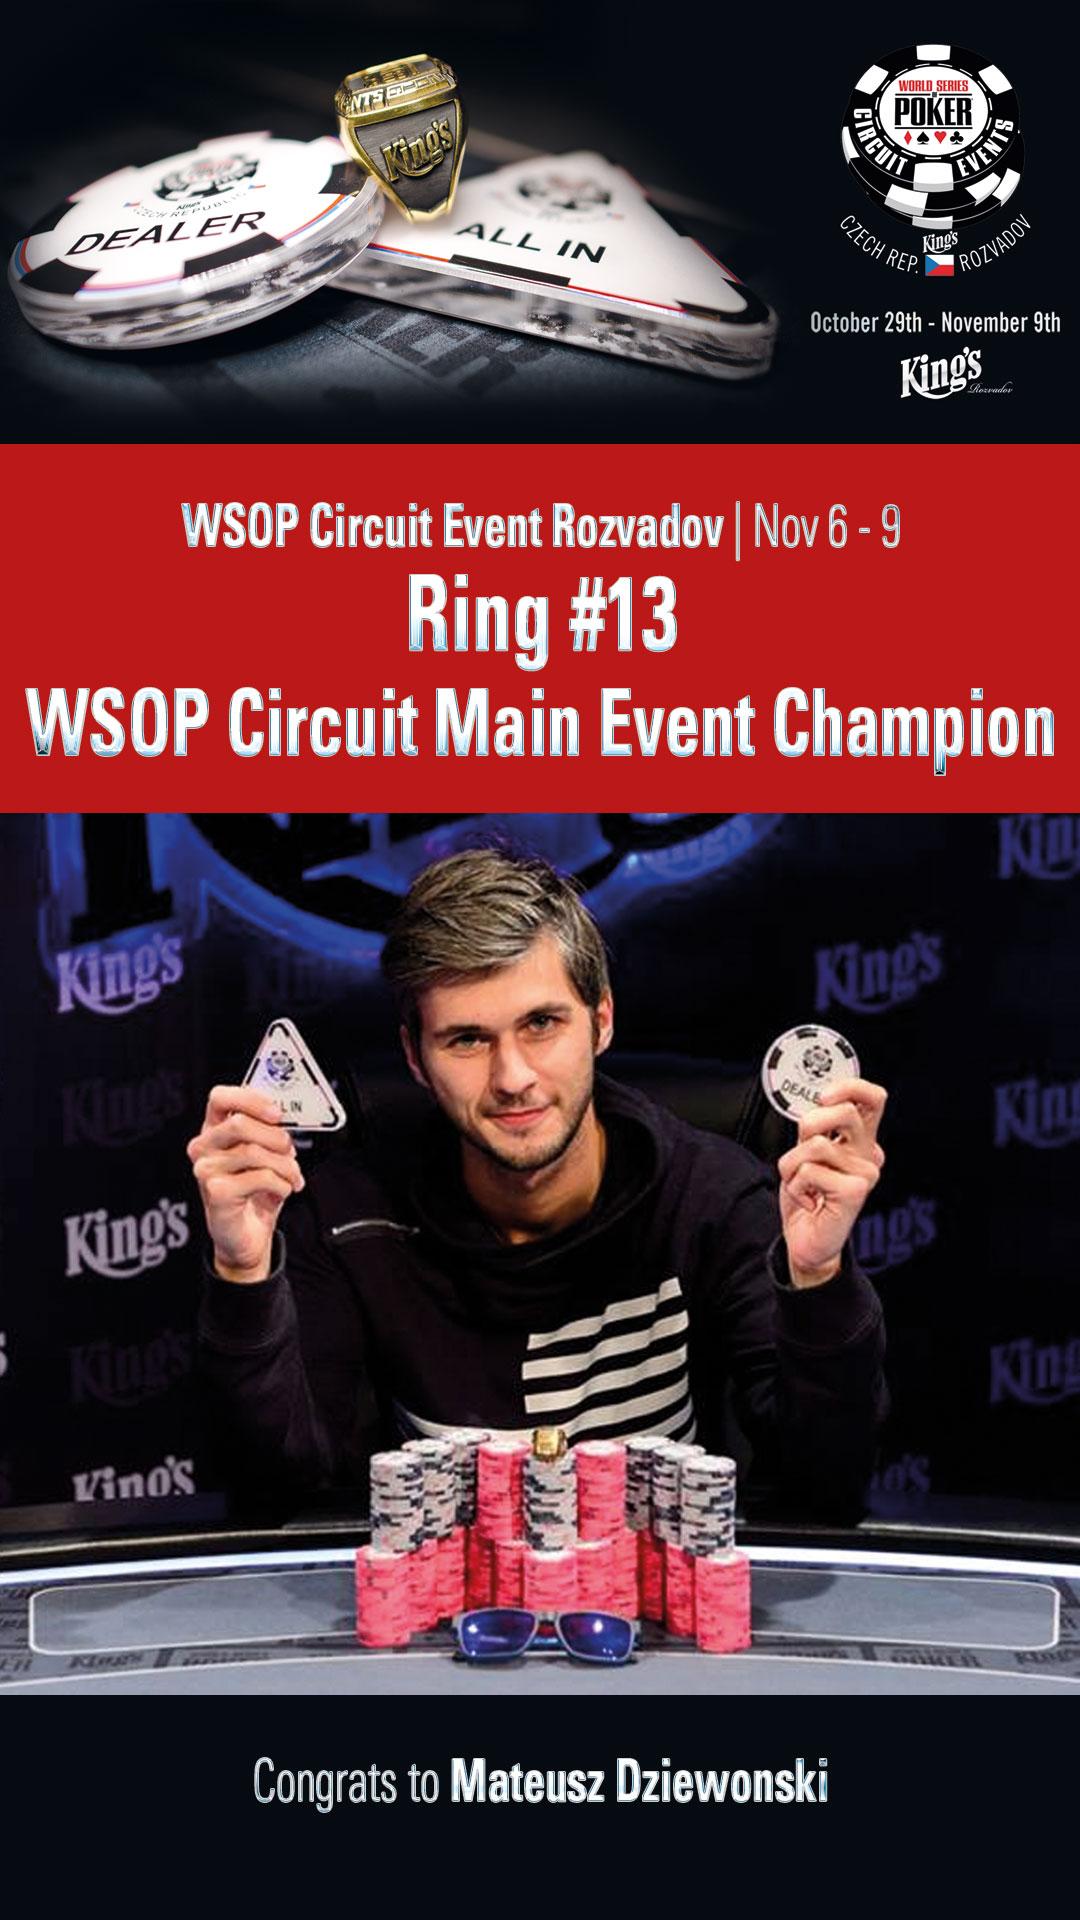 WSOP Circuit Rozvadov Main Event Sieger Mateusz Dziewonski (POL)